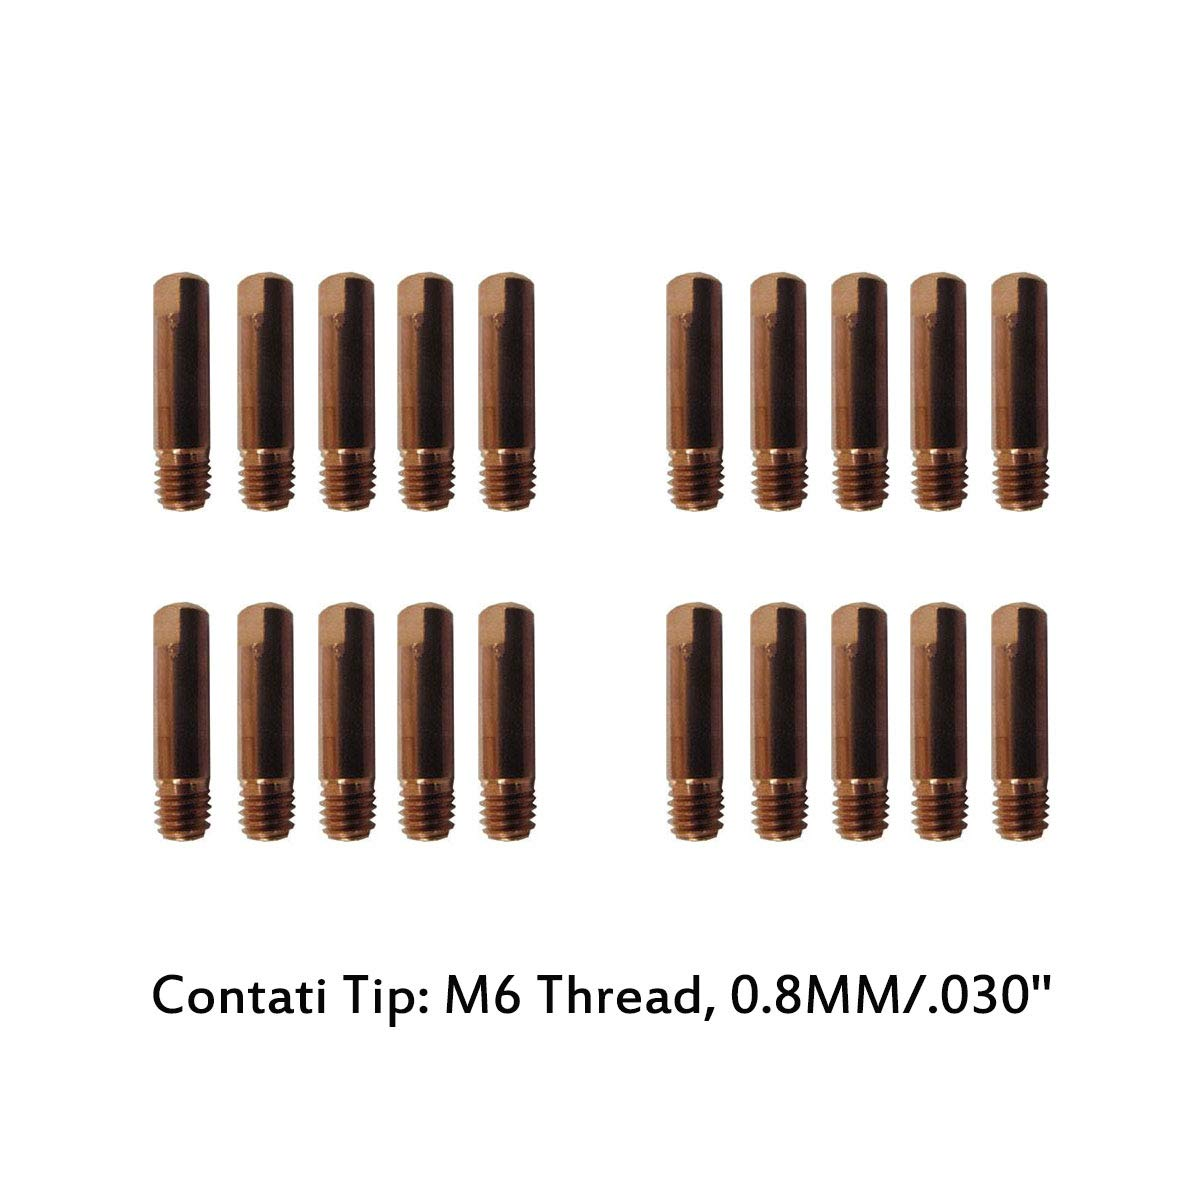 Contact Tips Holder Diffuser Nozzle fits Everlast Power i-MIG 140E MIG Welder